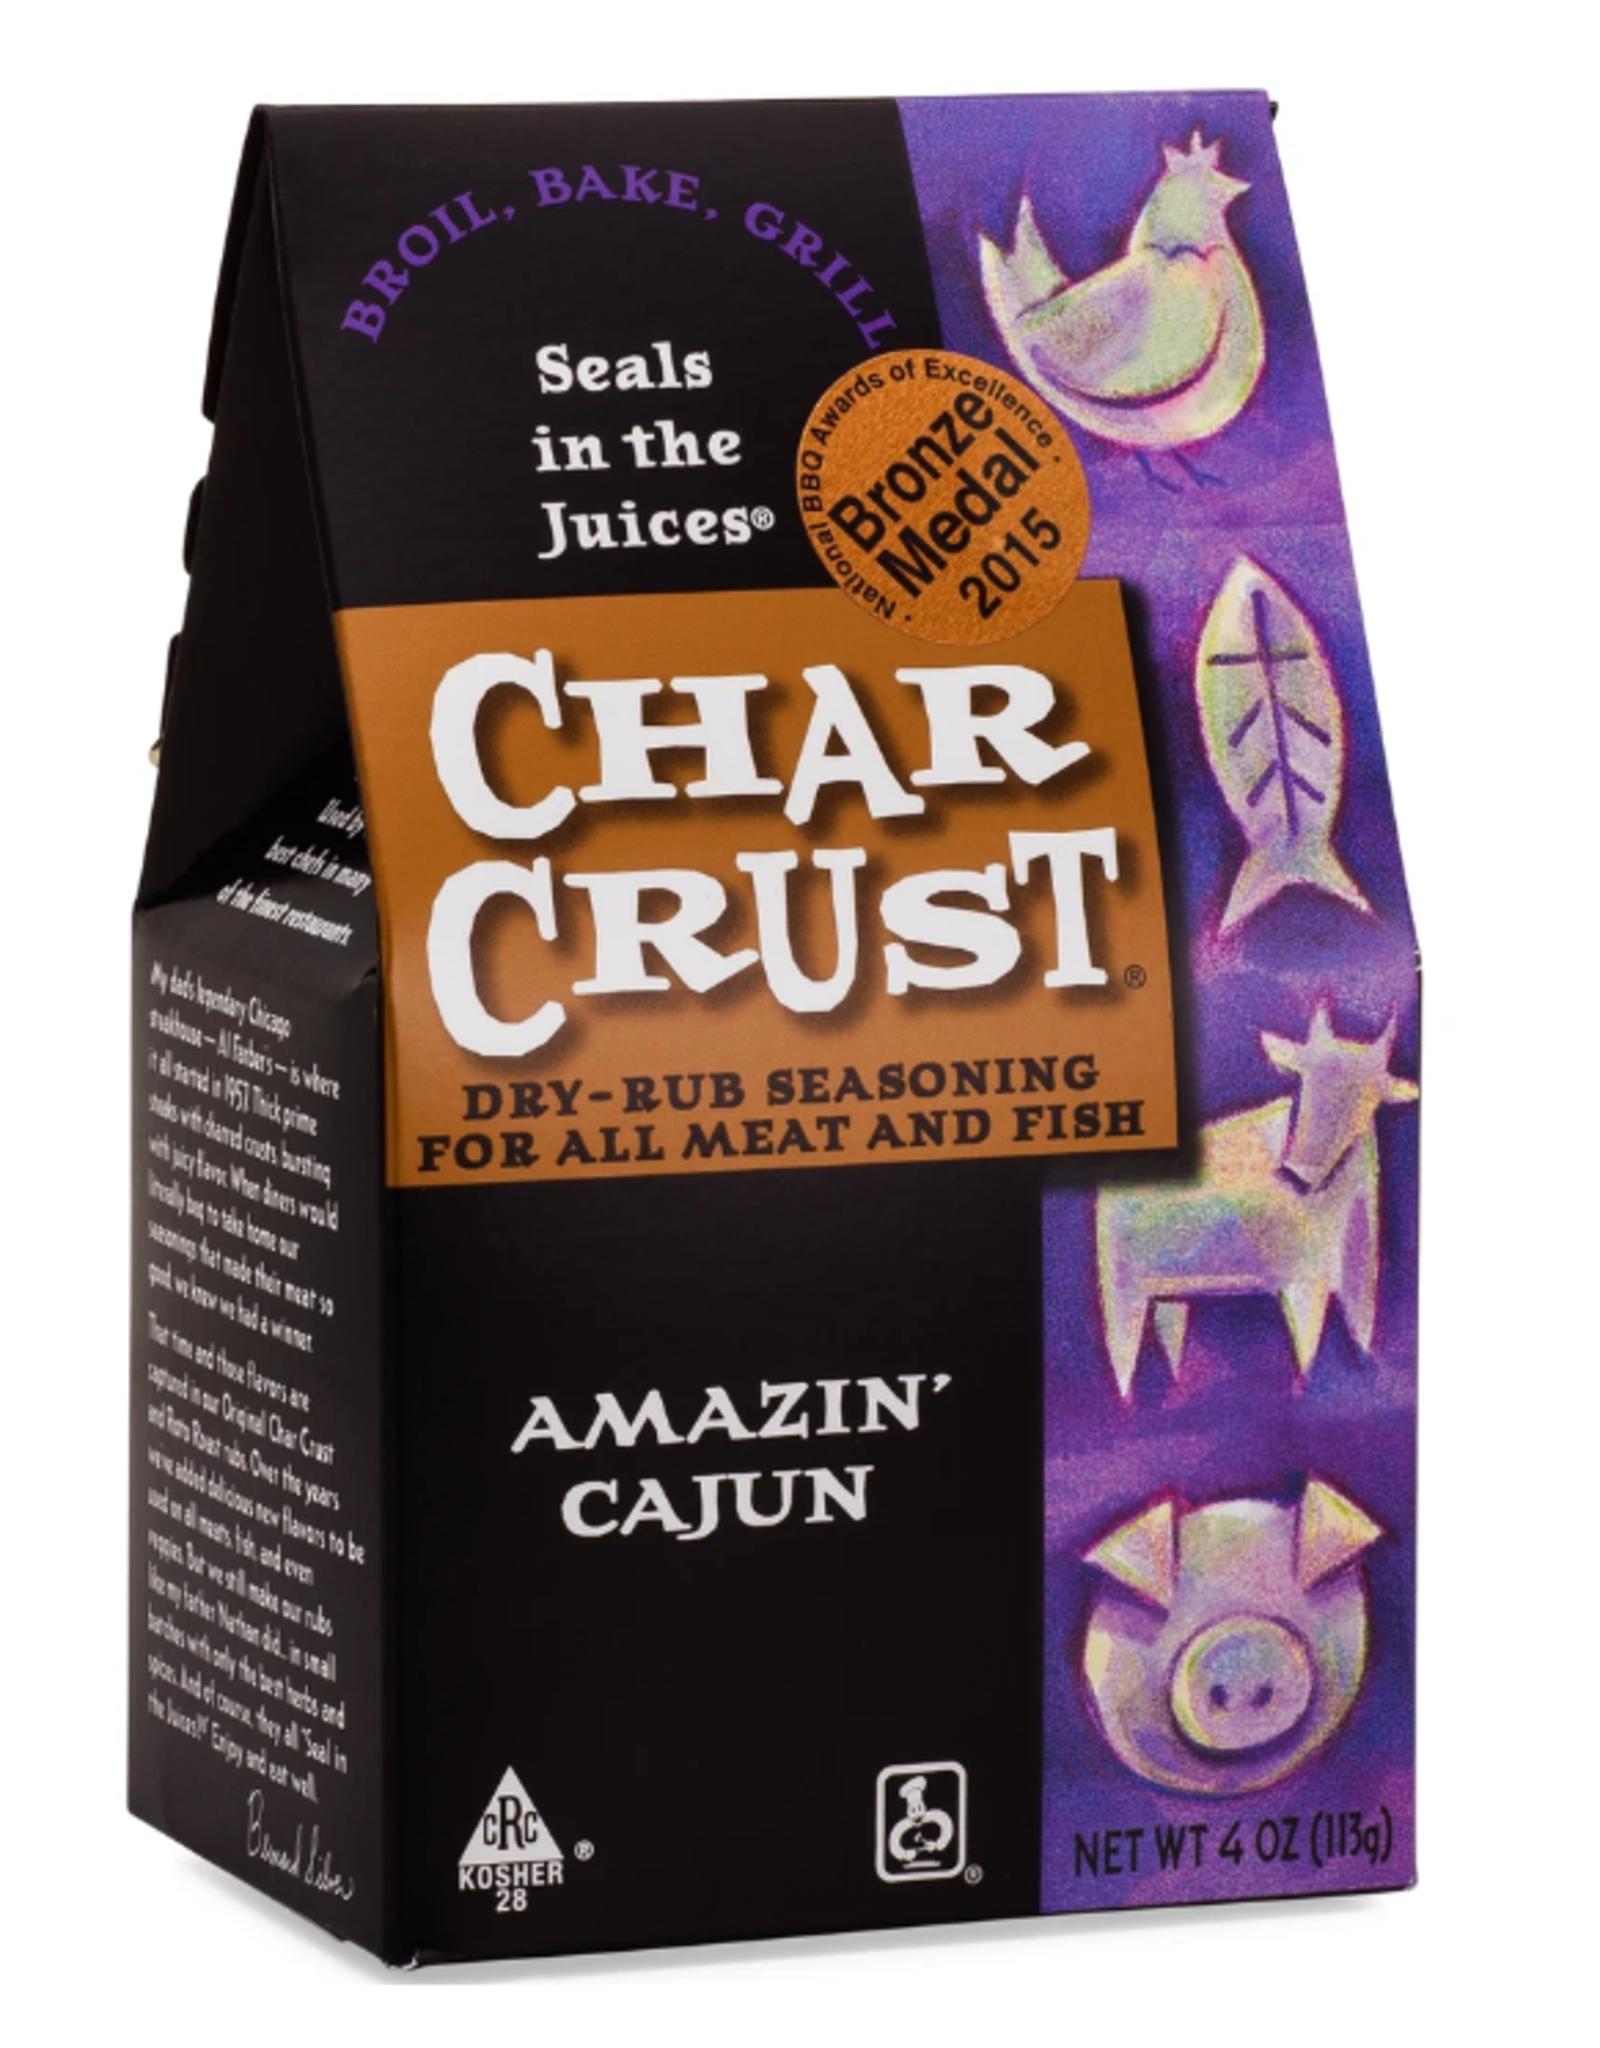 Charcrust Charcrust Rub, Amazin' Cajun